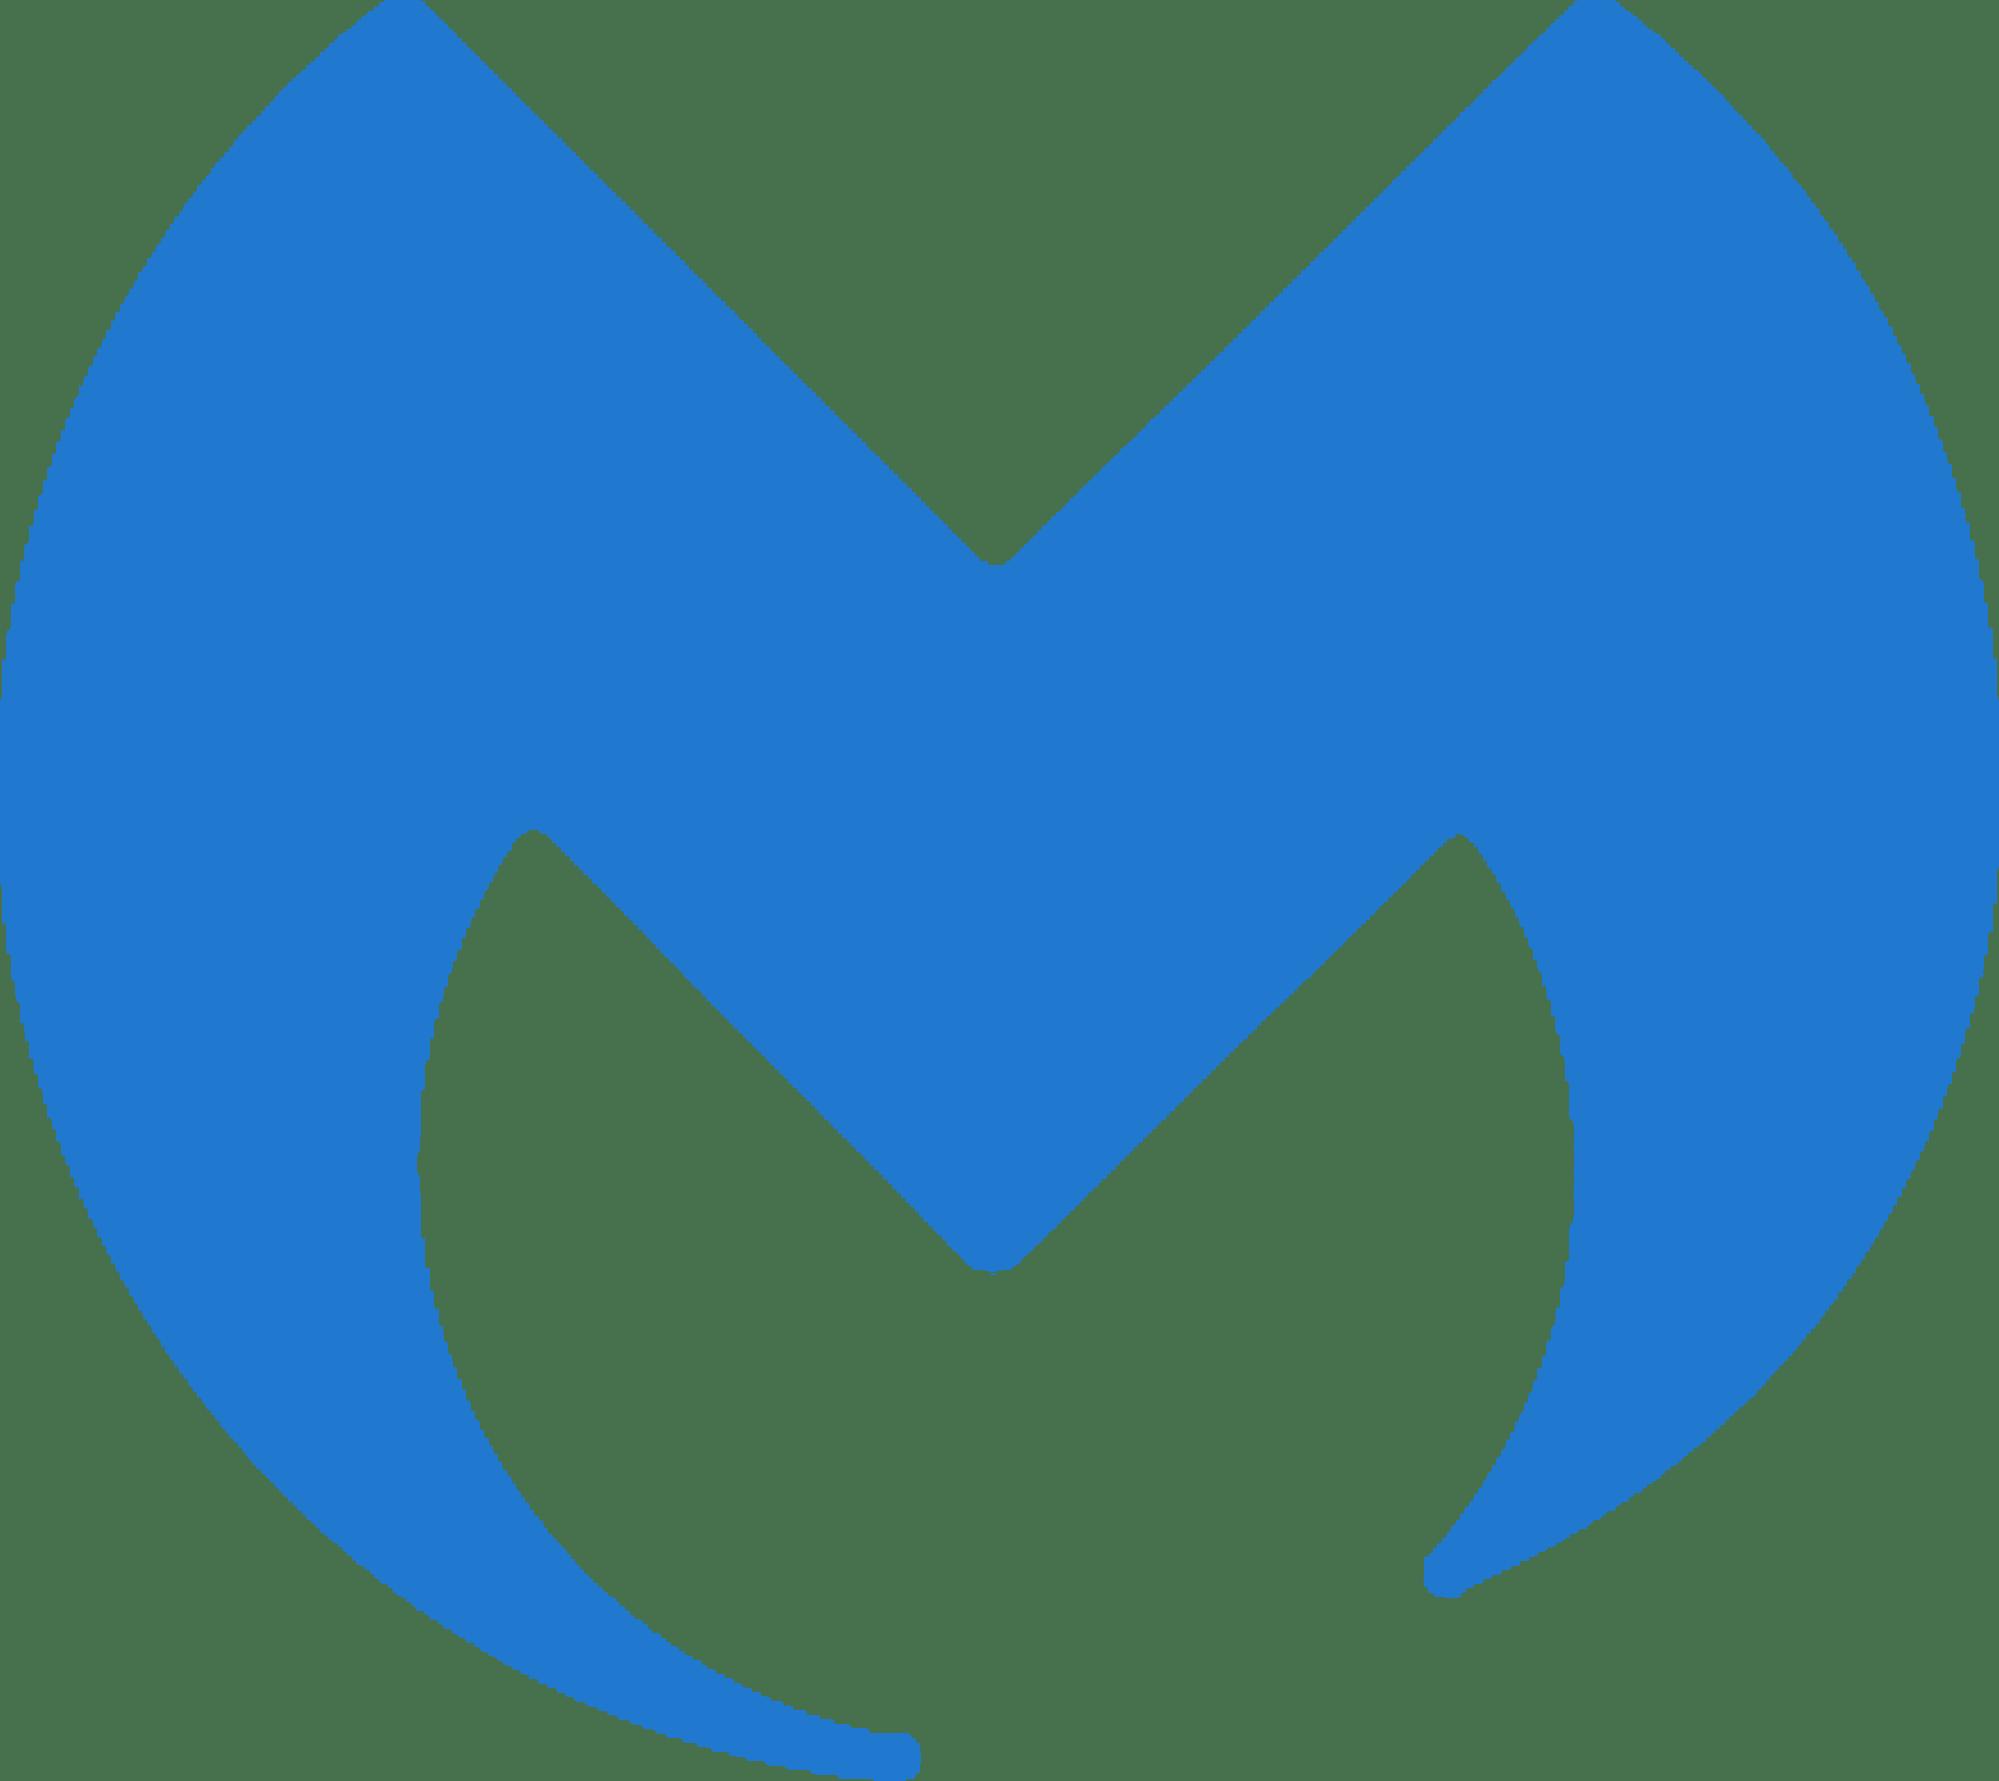 Deploying MalwareBytes Anti-Malware Utility With PowerShell